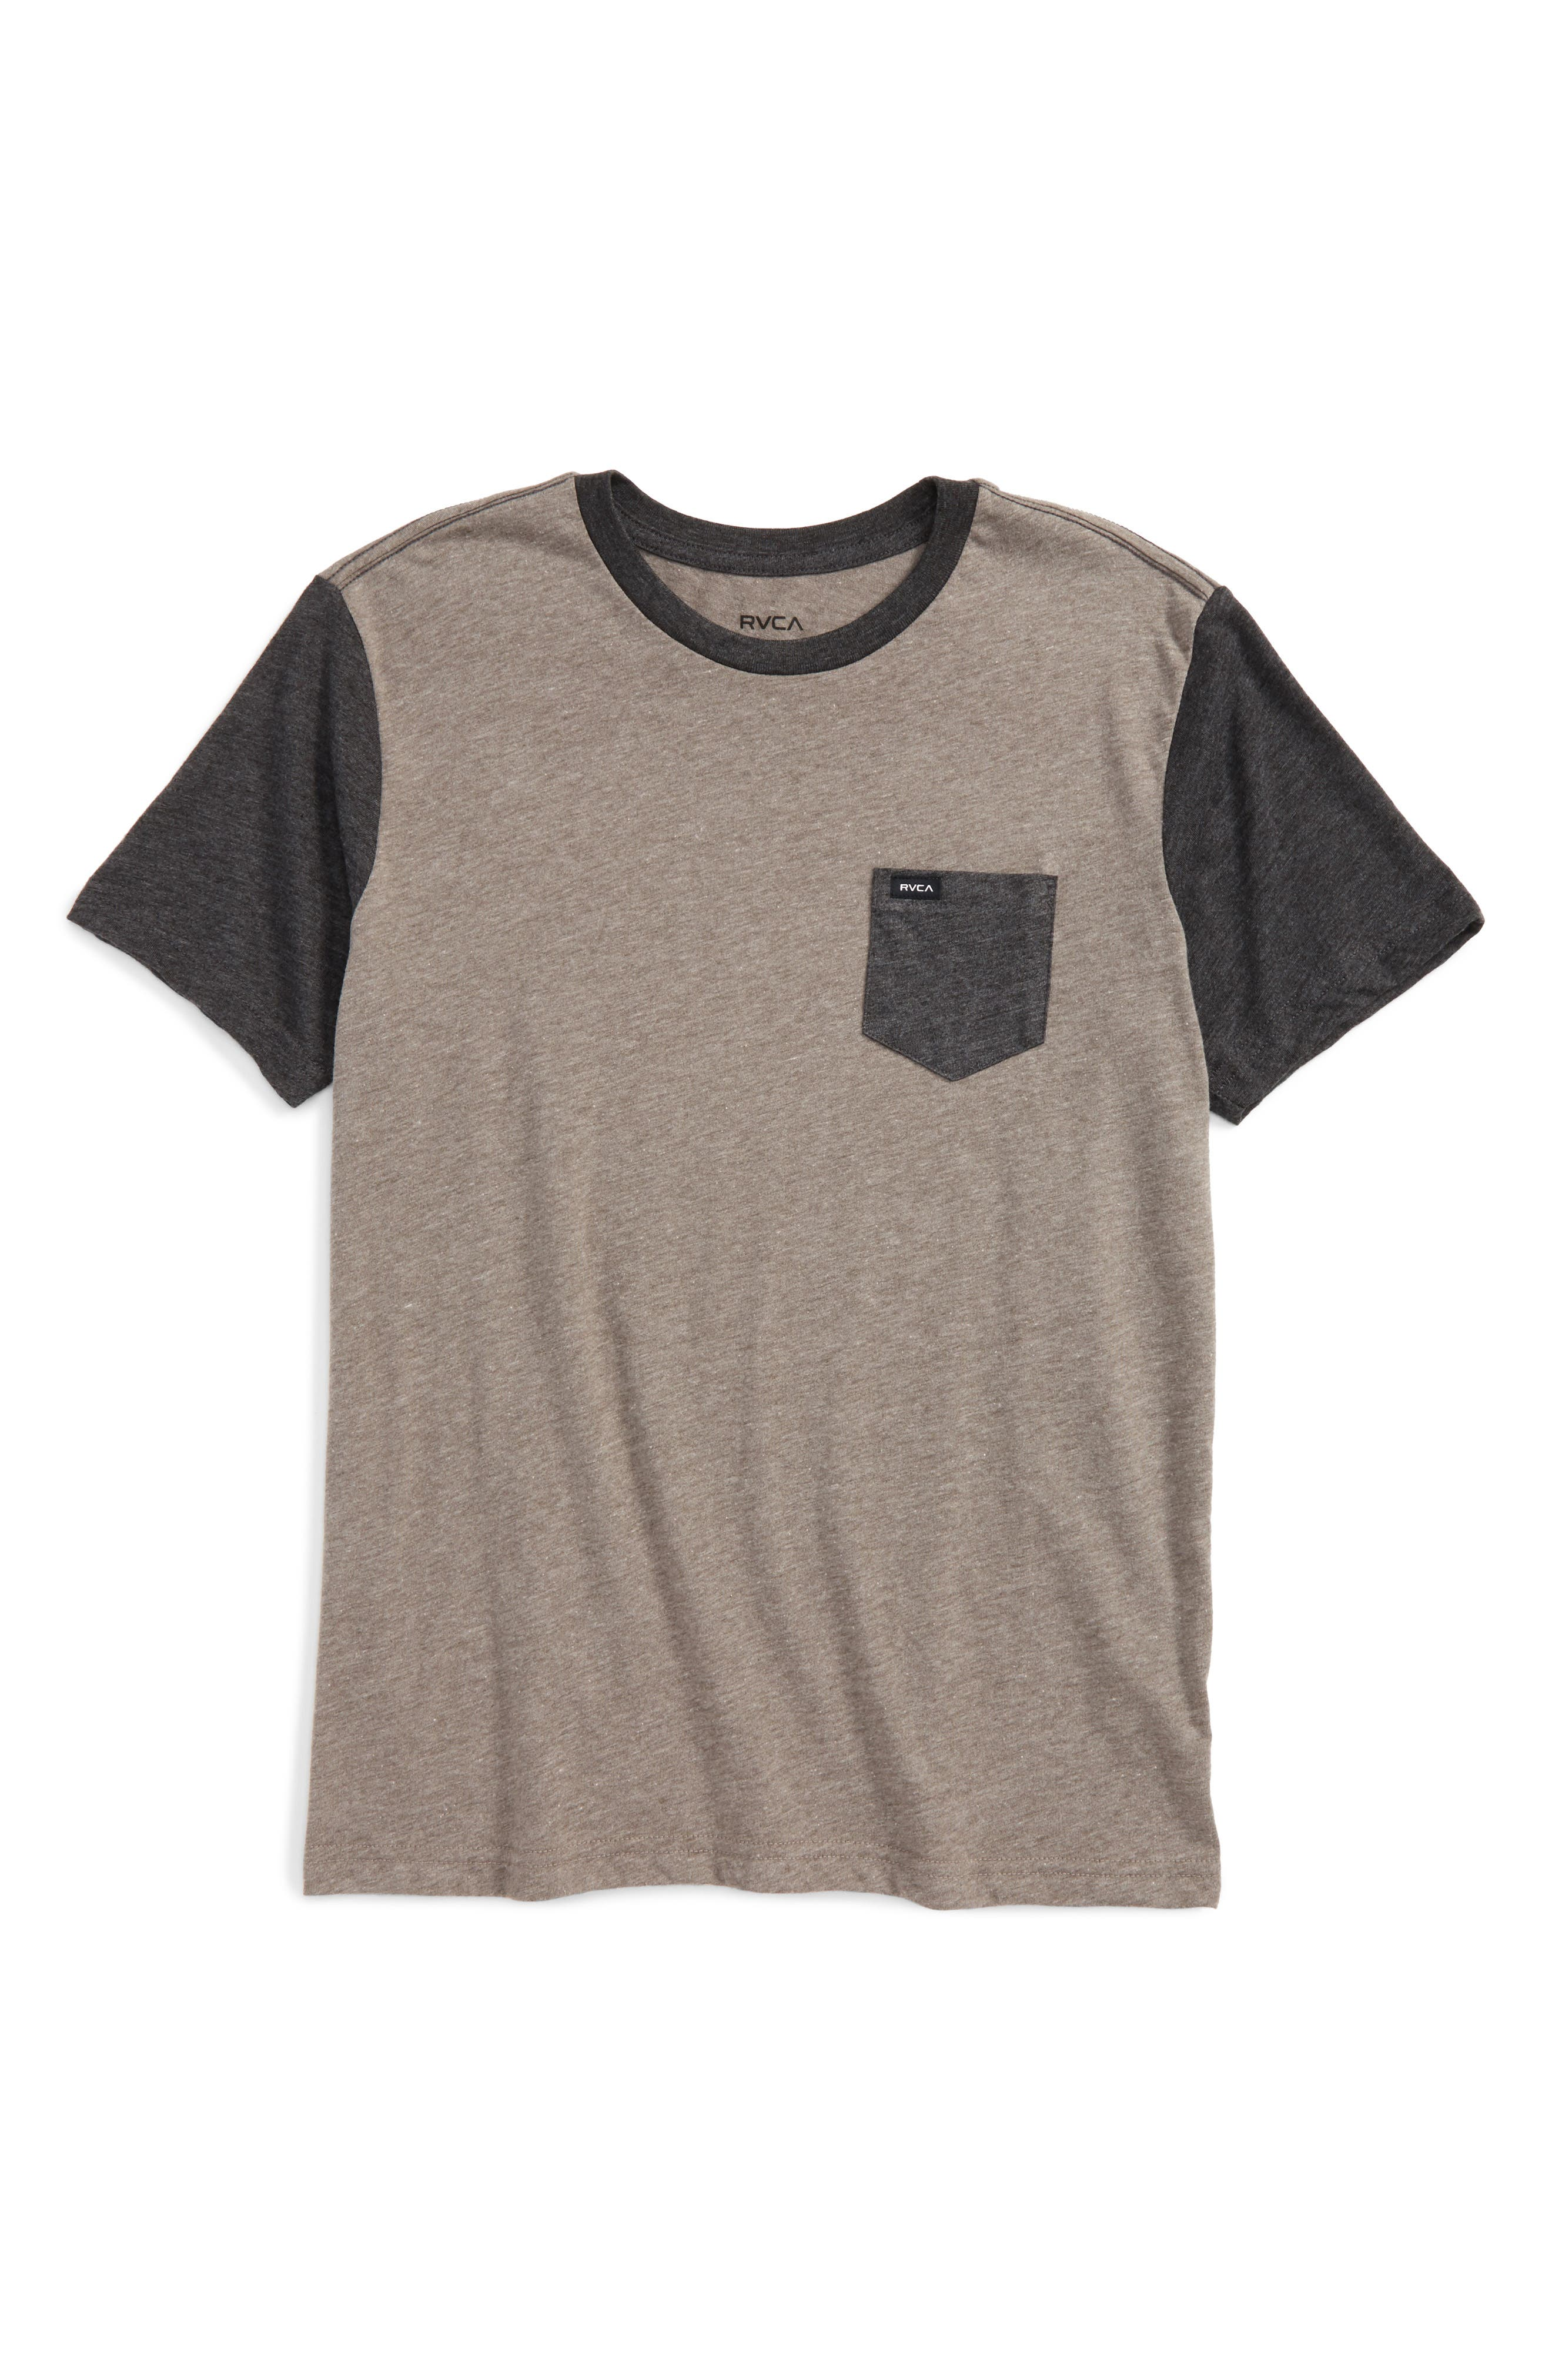 RVCA 'Change Up' Graphic T-Shirt (Big Boys)